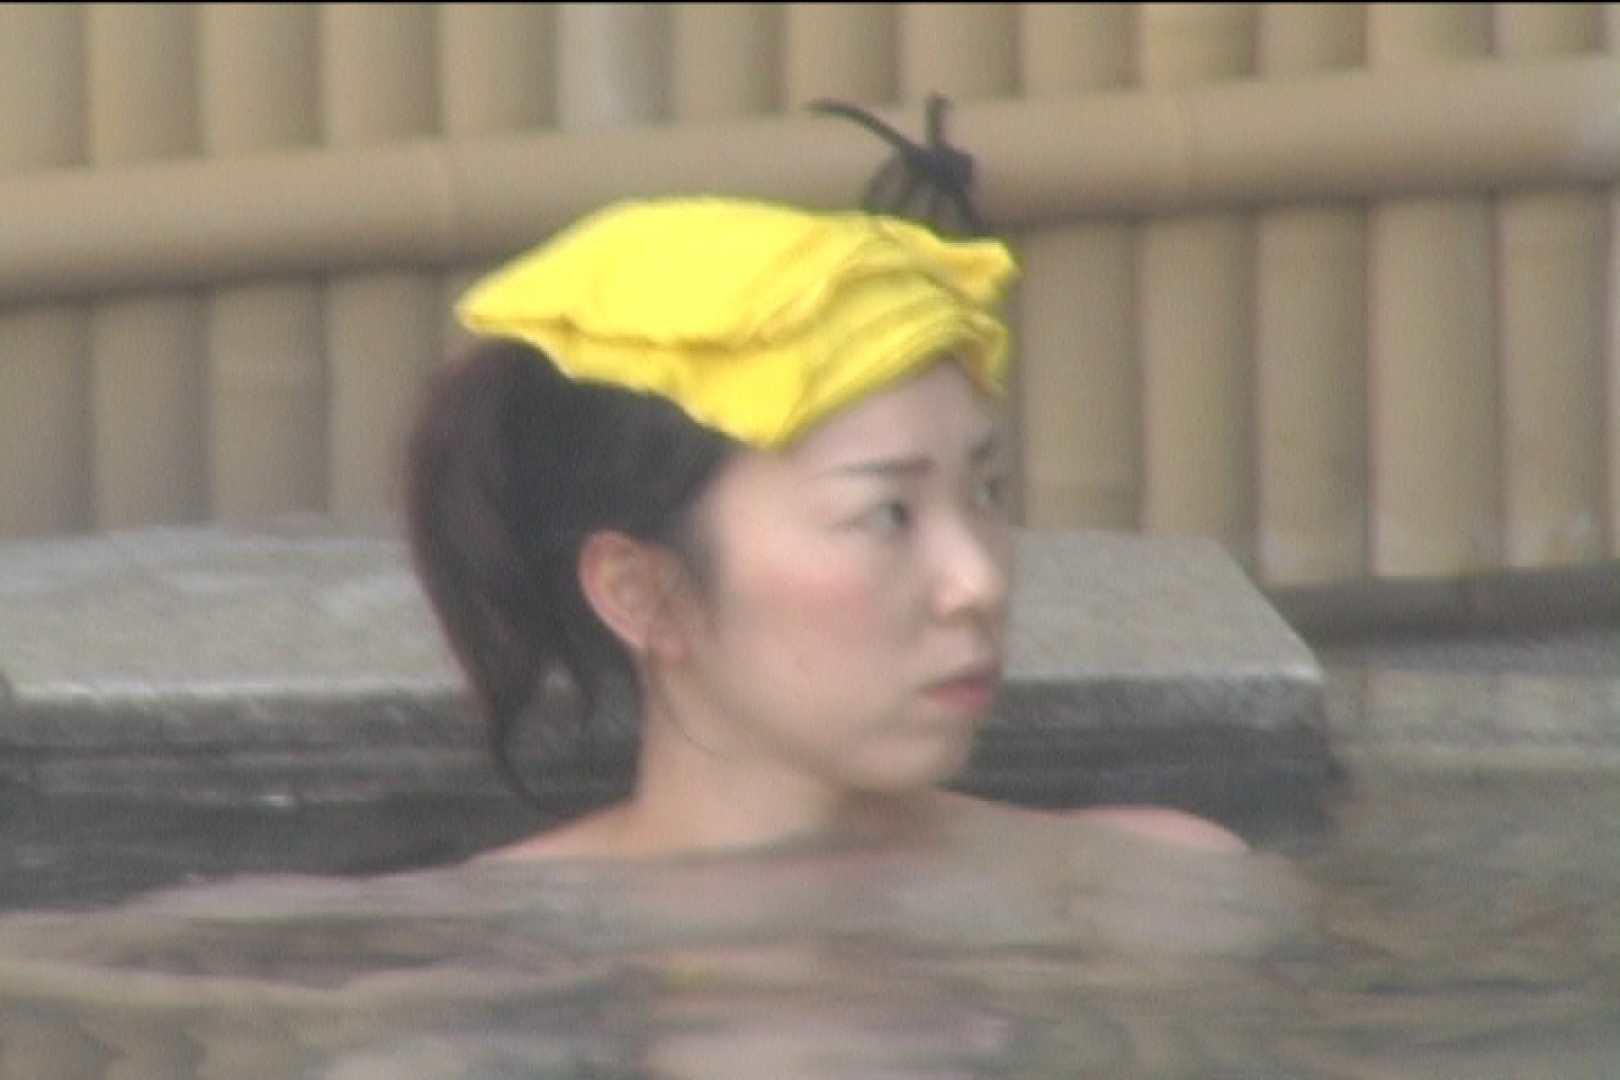 Aquaな露天風呂Vol.529 盗撮映像  51Pix 36